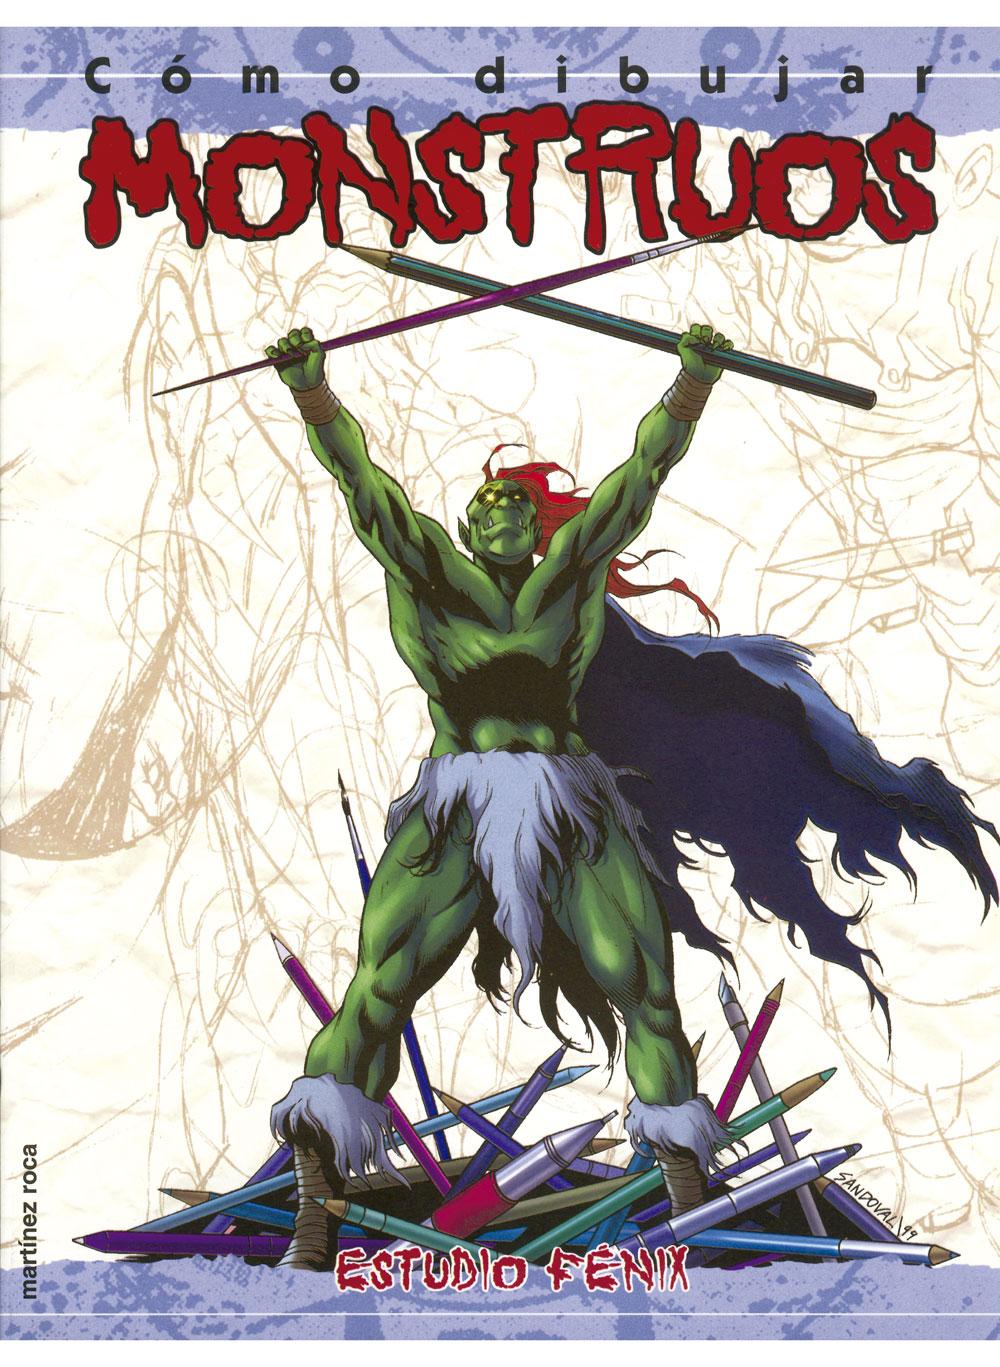 Cómo_dibujar_monstruosc_Cover.jpg